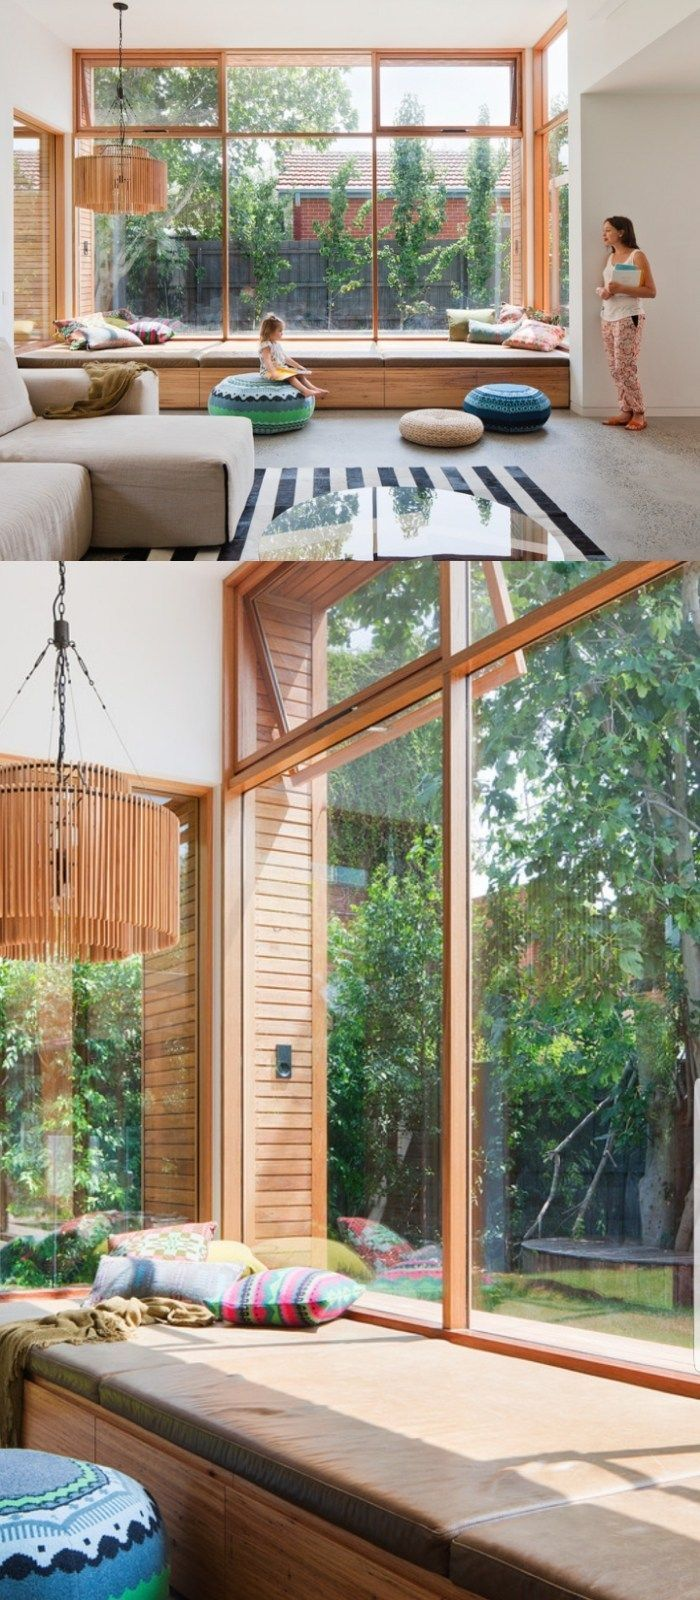 30+ Bay Window Ideas for your Bedroom, Kitchen & L em 30